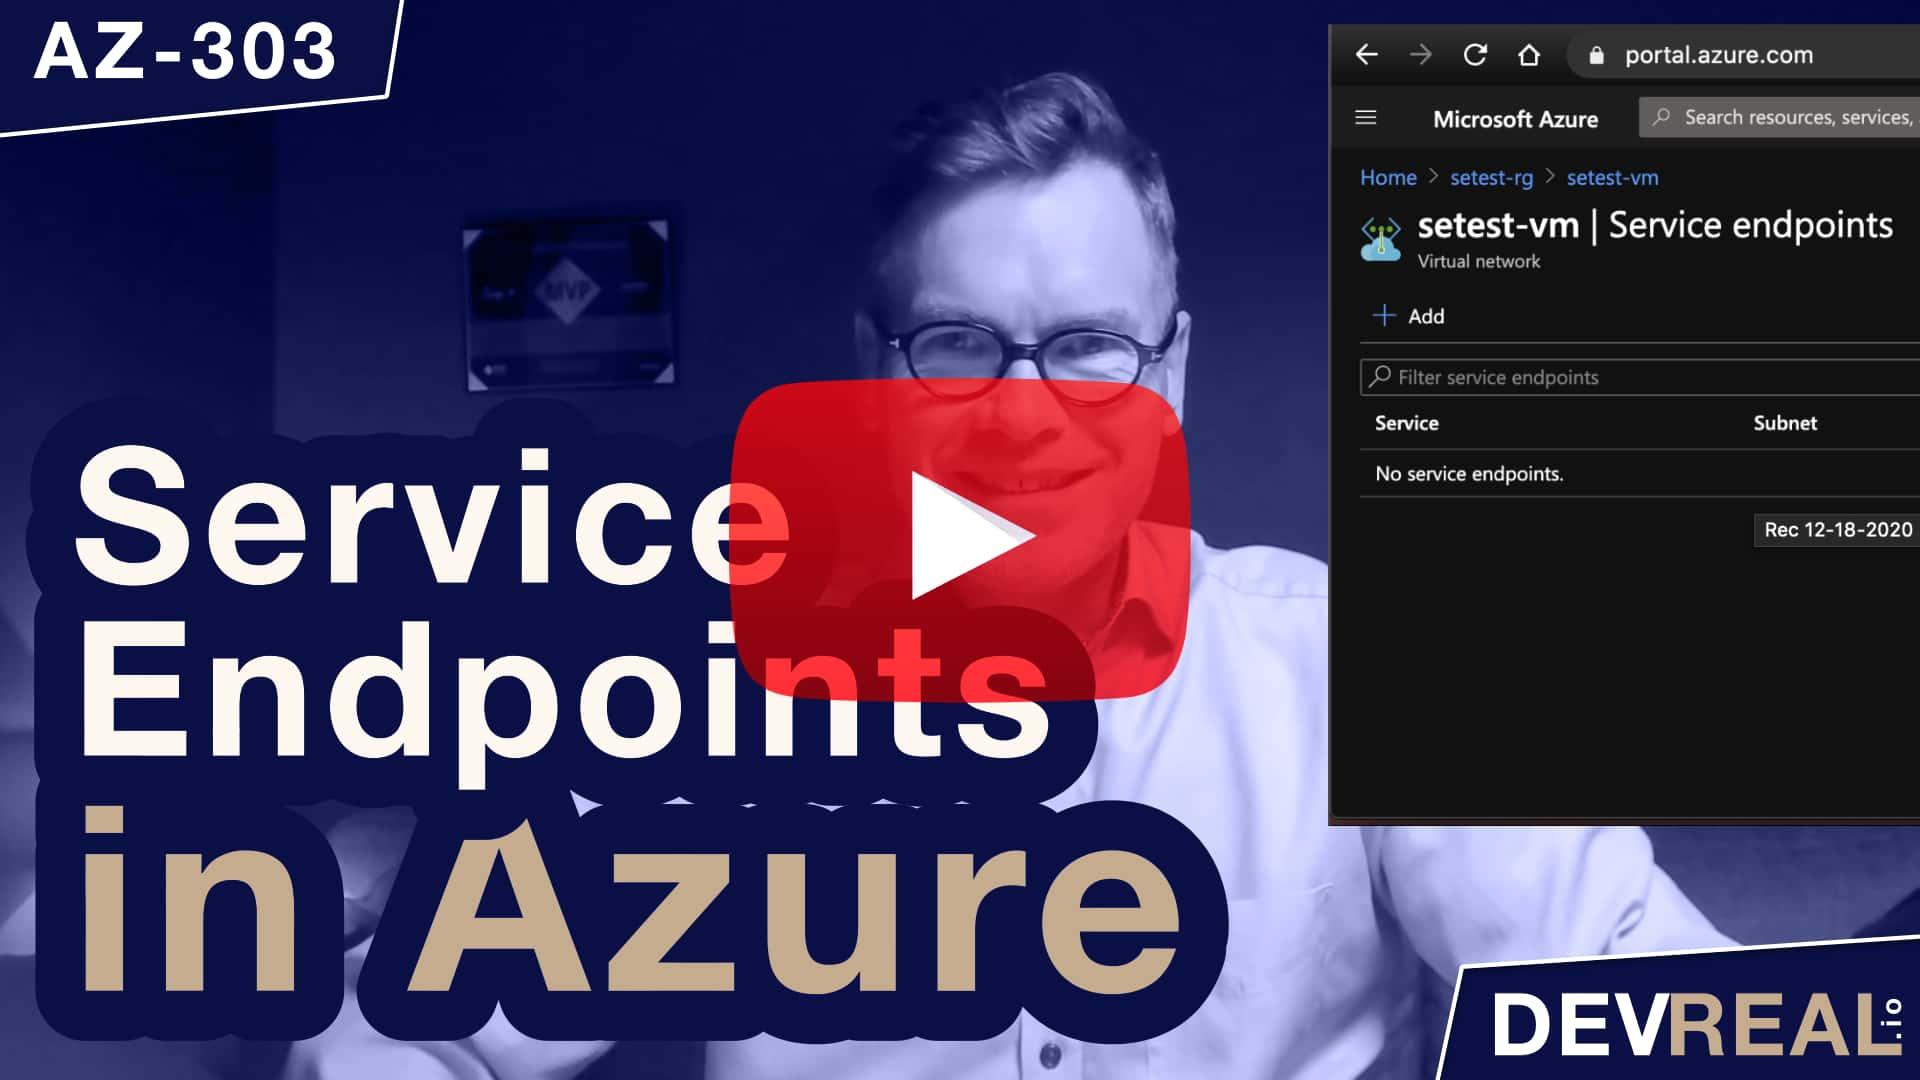 AZ-303: Service Endpoints in Azure